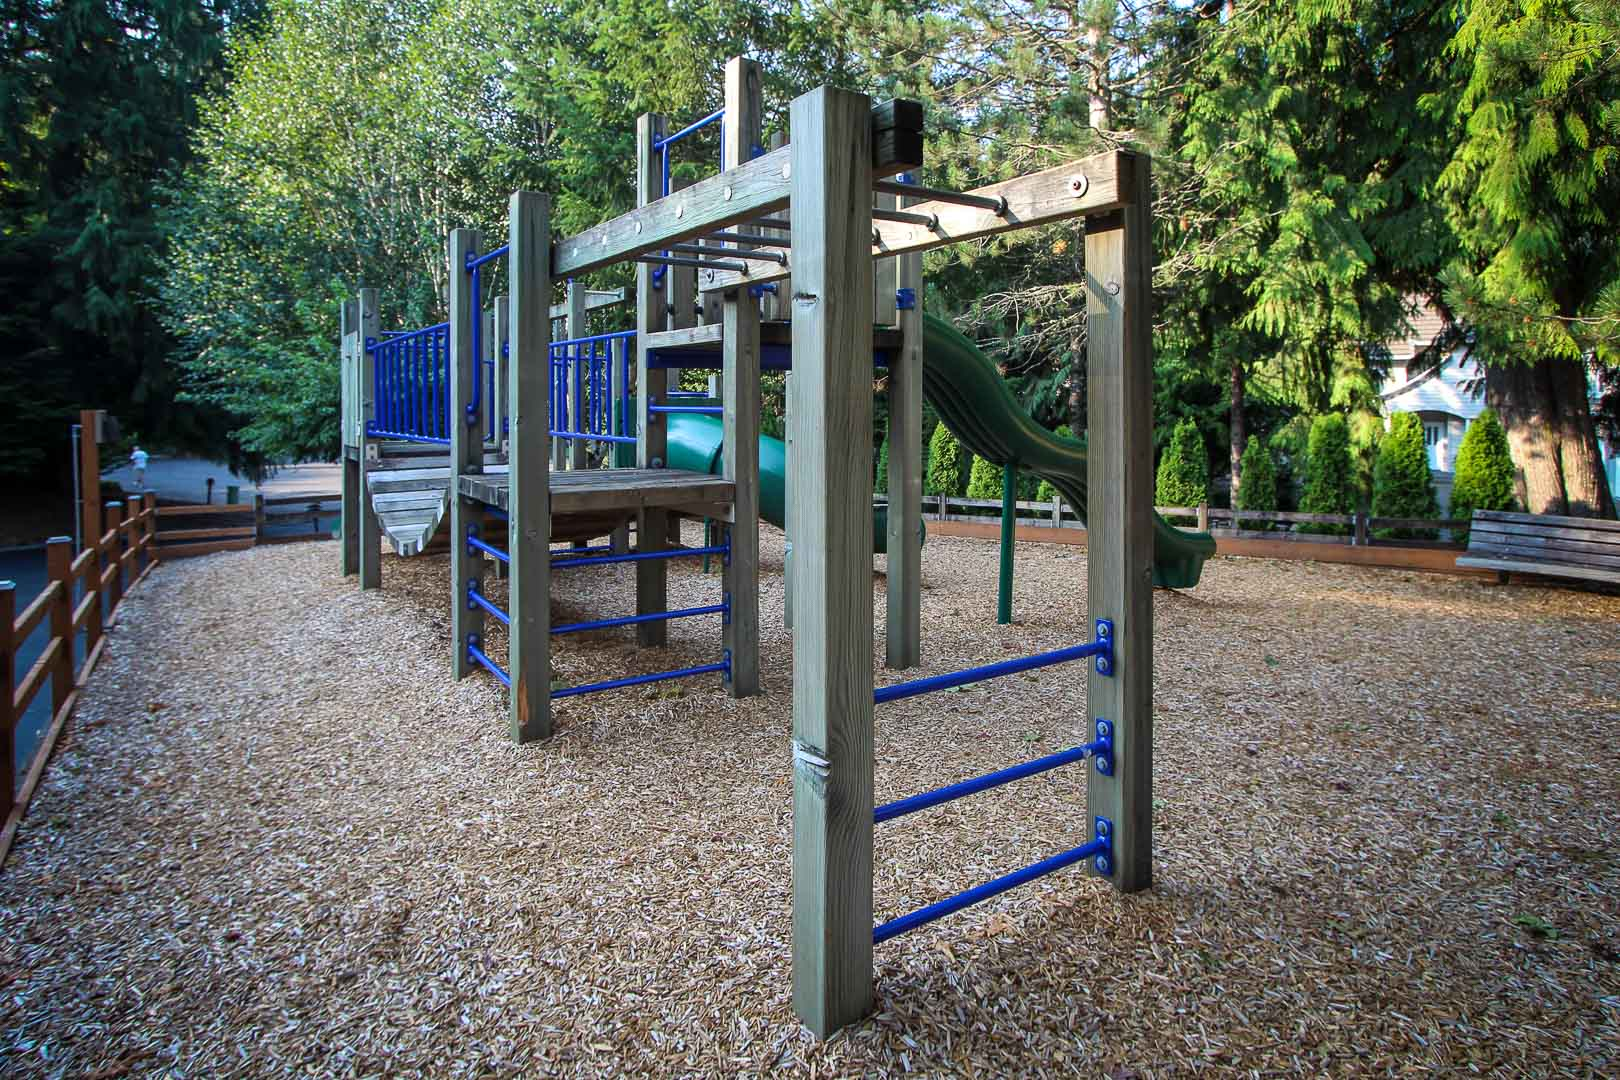 An enjoyable playground at VRI's Whispering Woods Resort in Oregon.